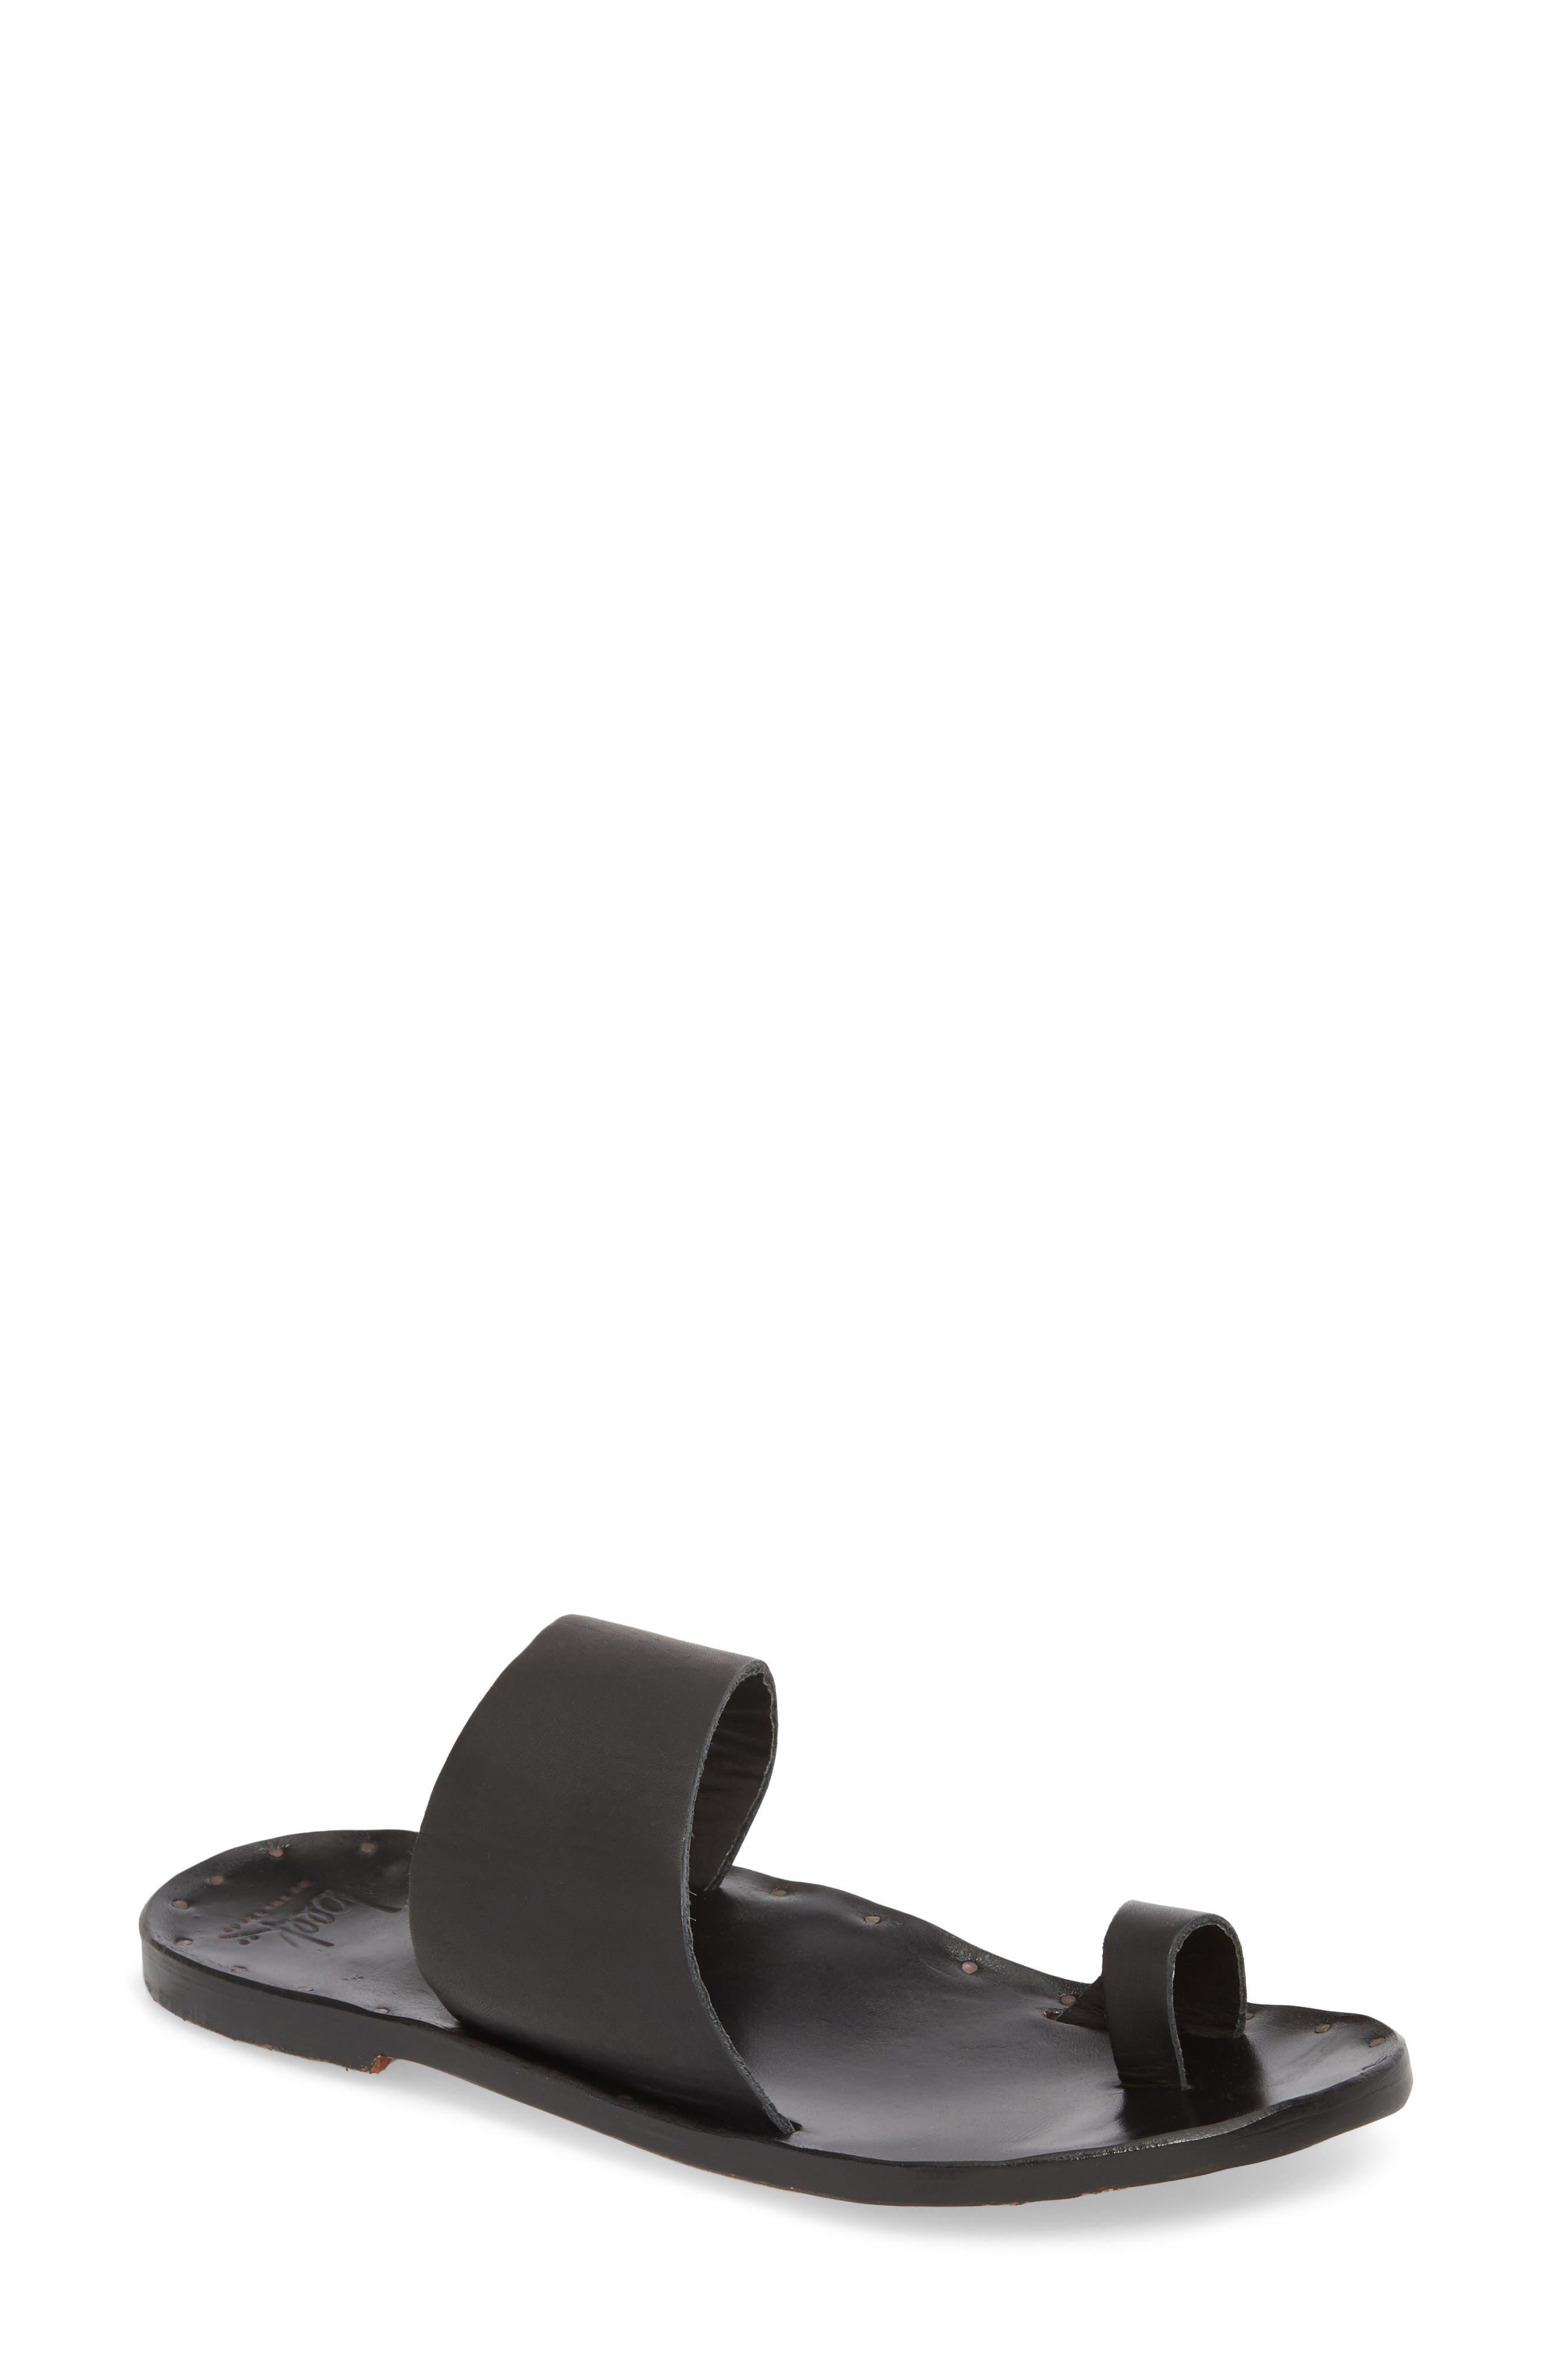 Finch Sandal,                         Main,                         color, BLACK/ BLACK